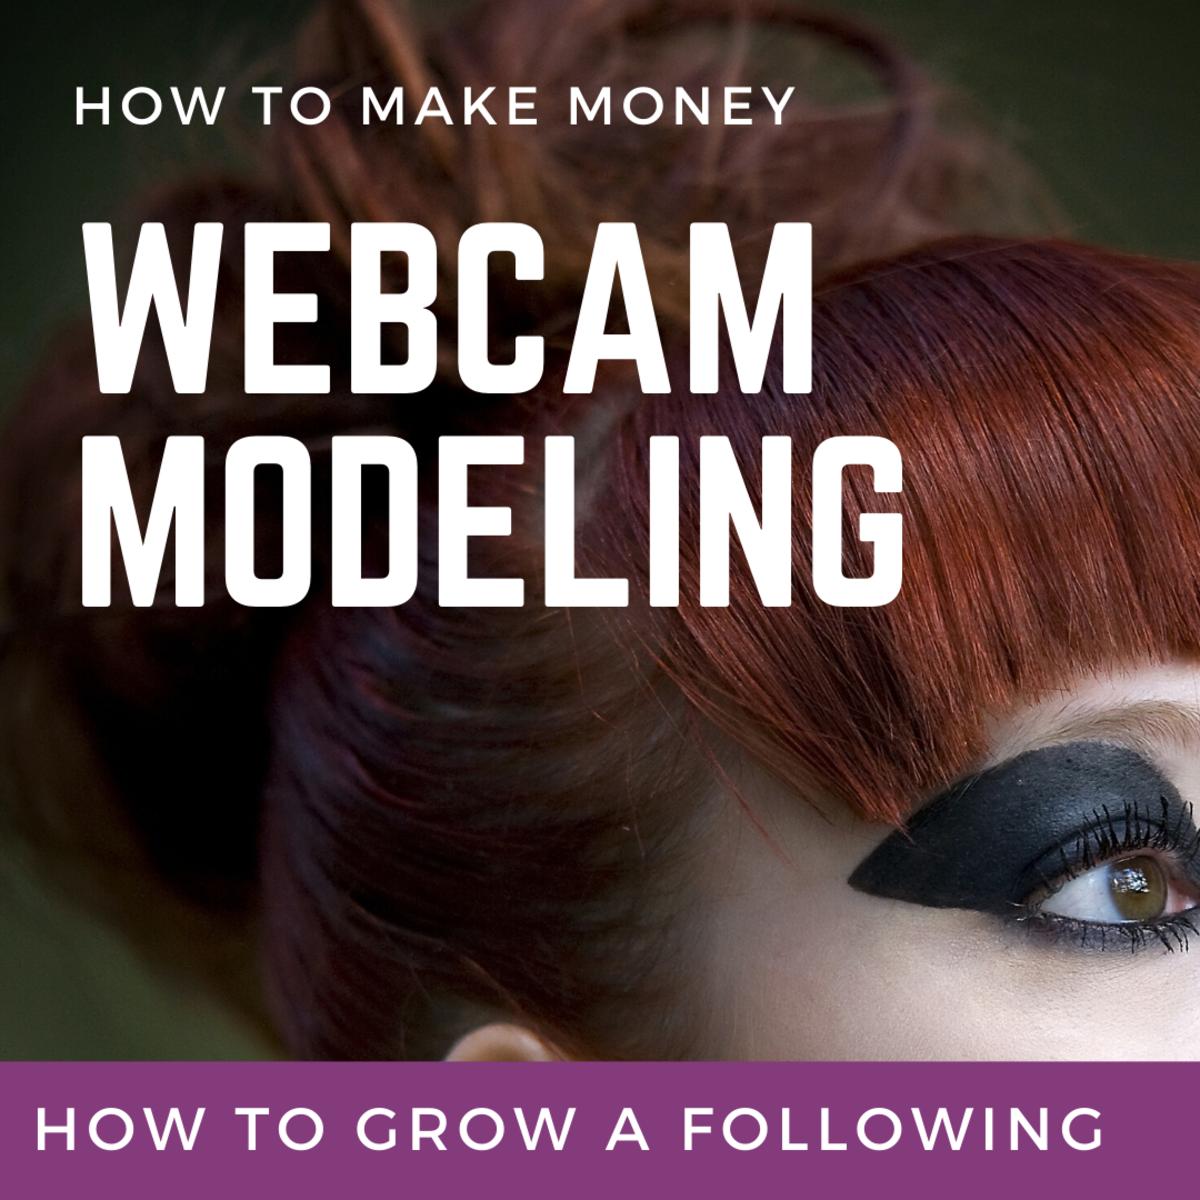 How to Make Money Webcam Modeling